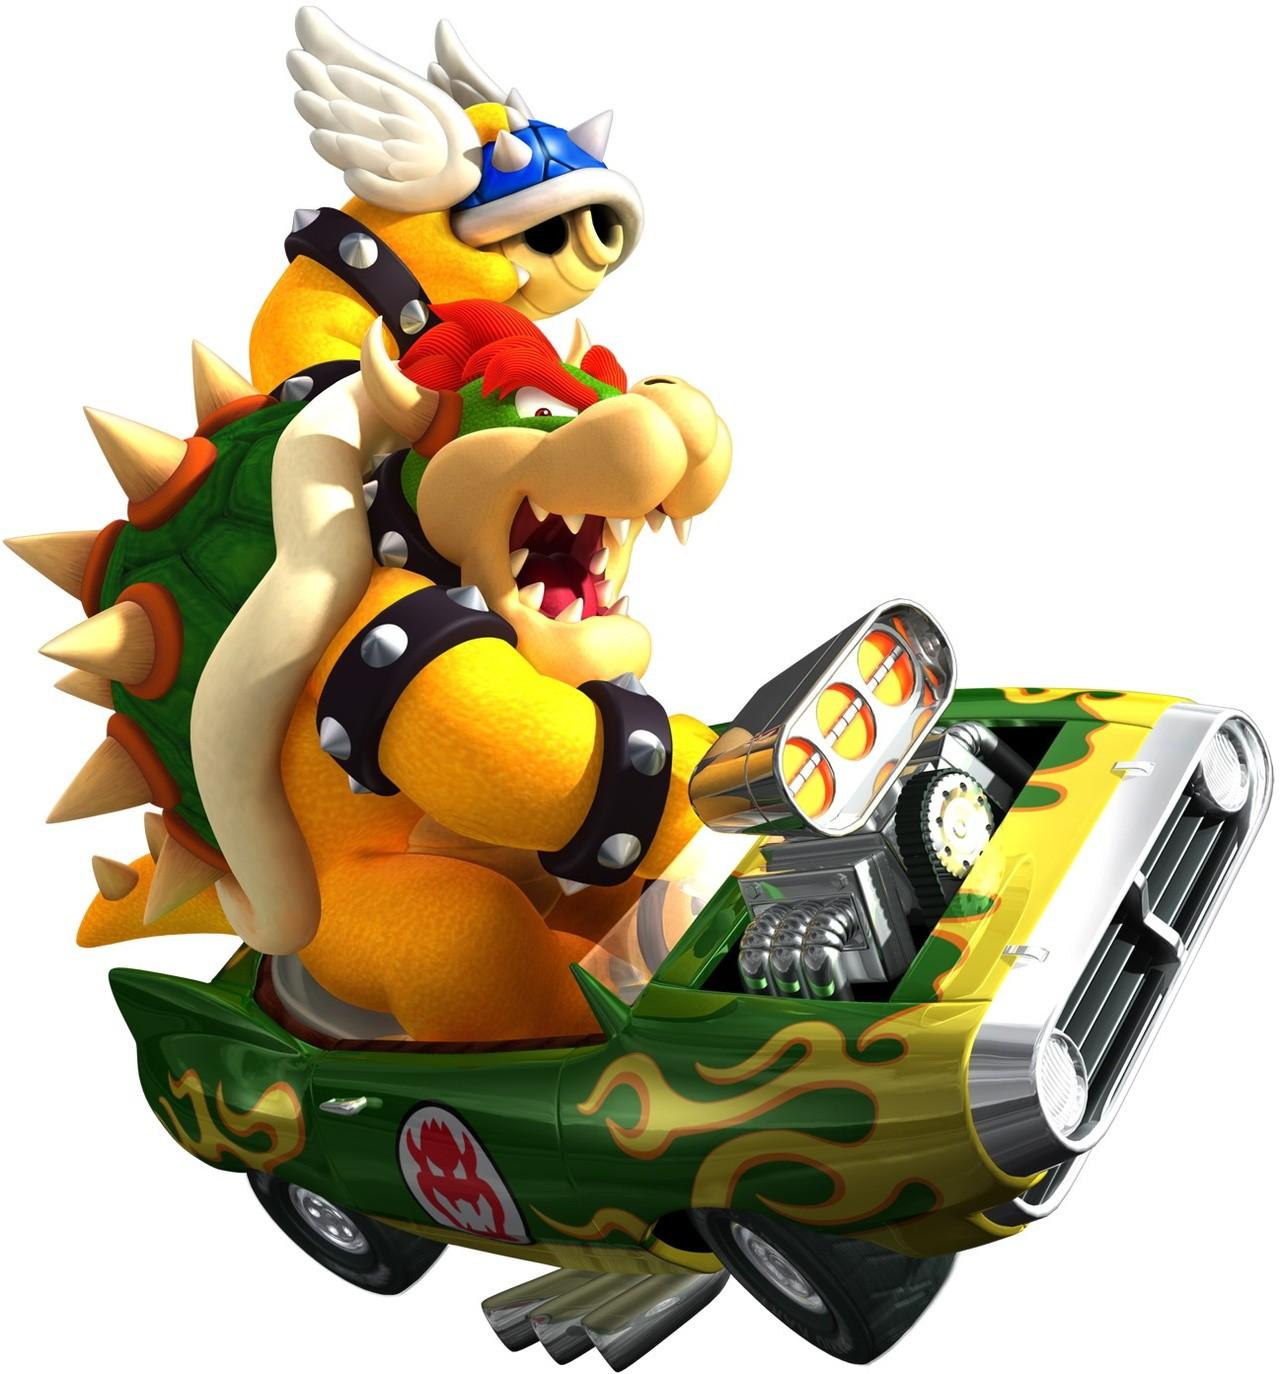 kart over flåm Flame Flyer | Mario Kart Racing Wiki | FANDOM powered by Wikia kart over flåm